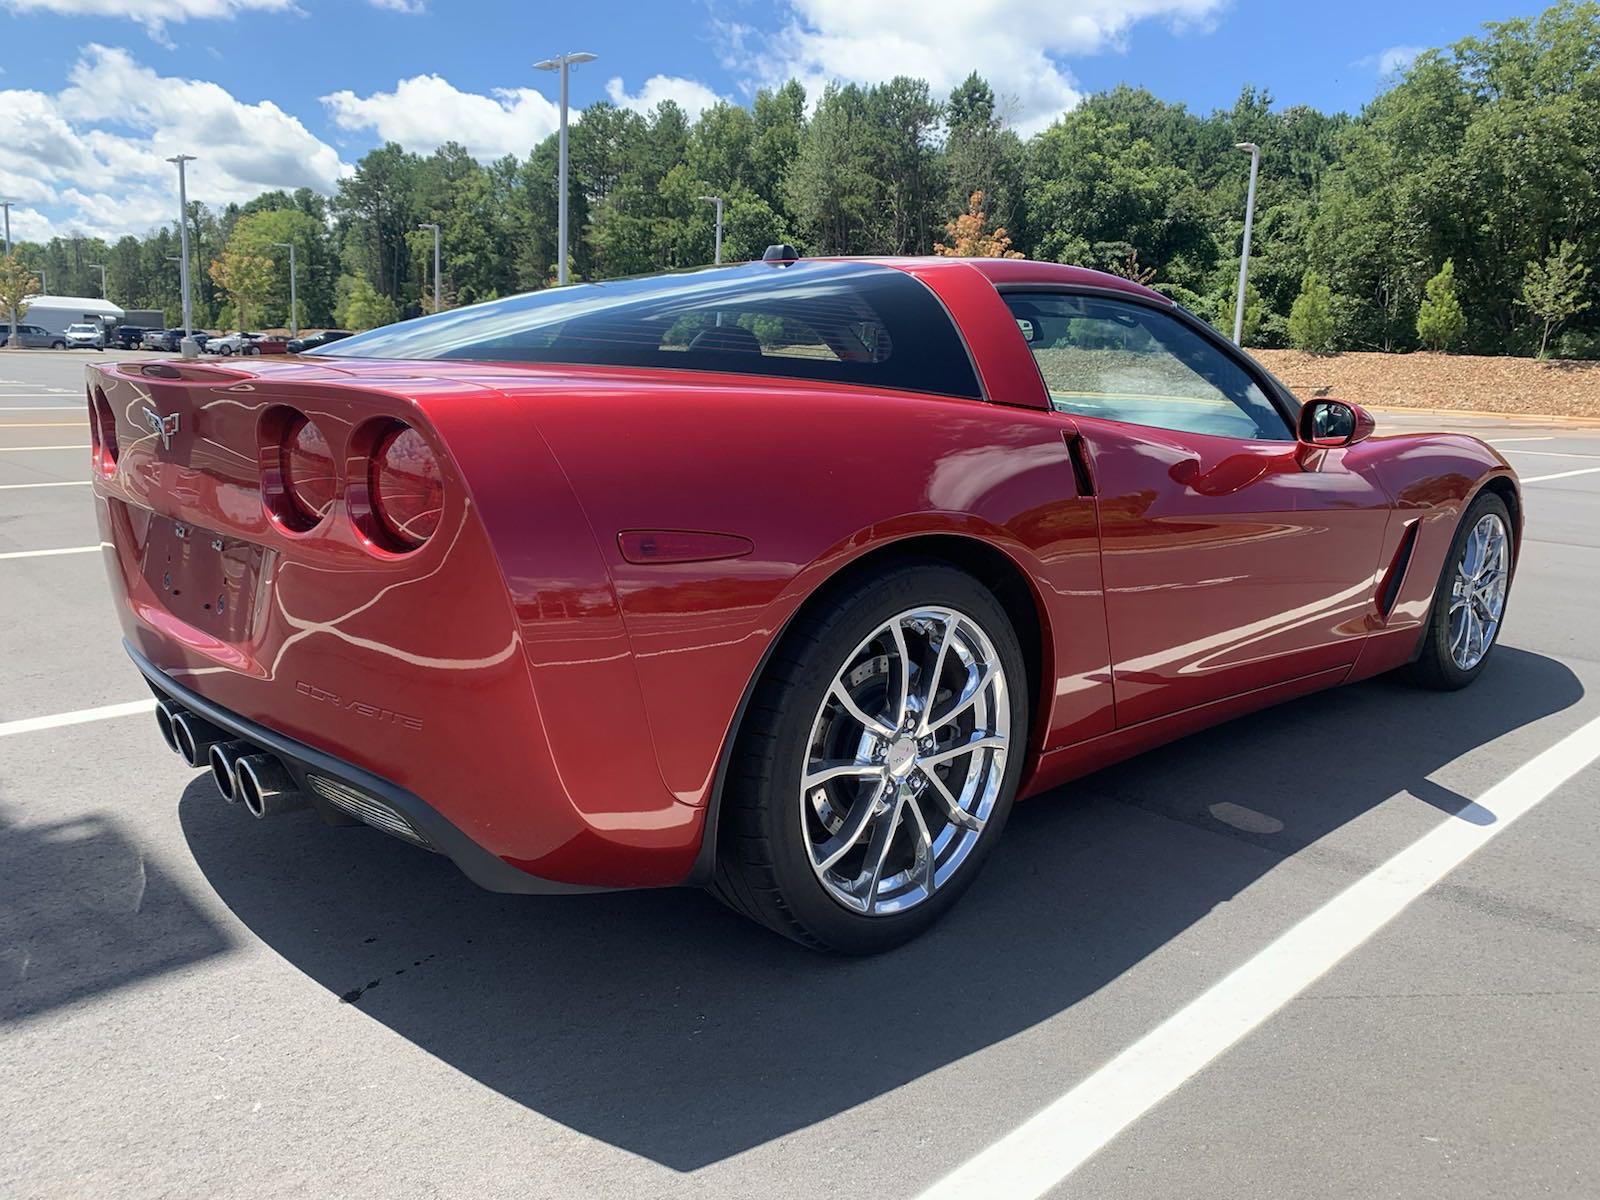 2005 Chevrolet Corvette 2dr Cpe